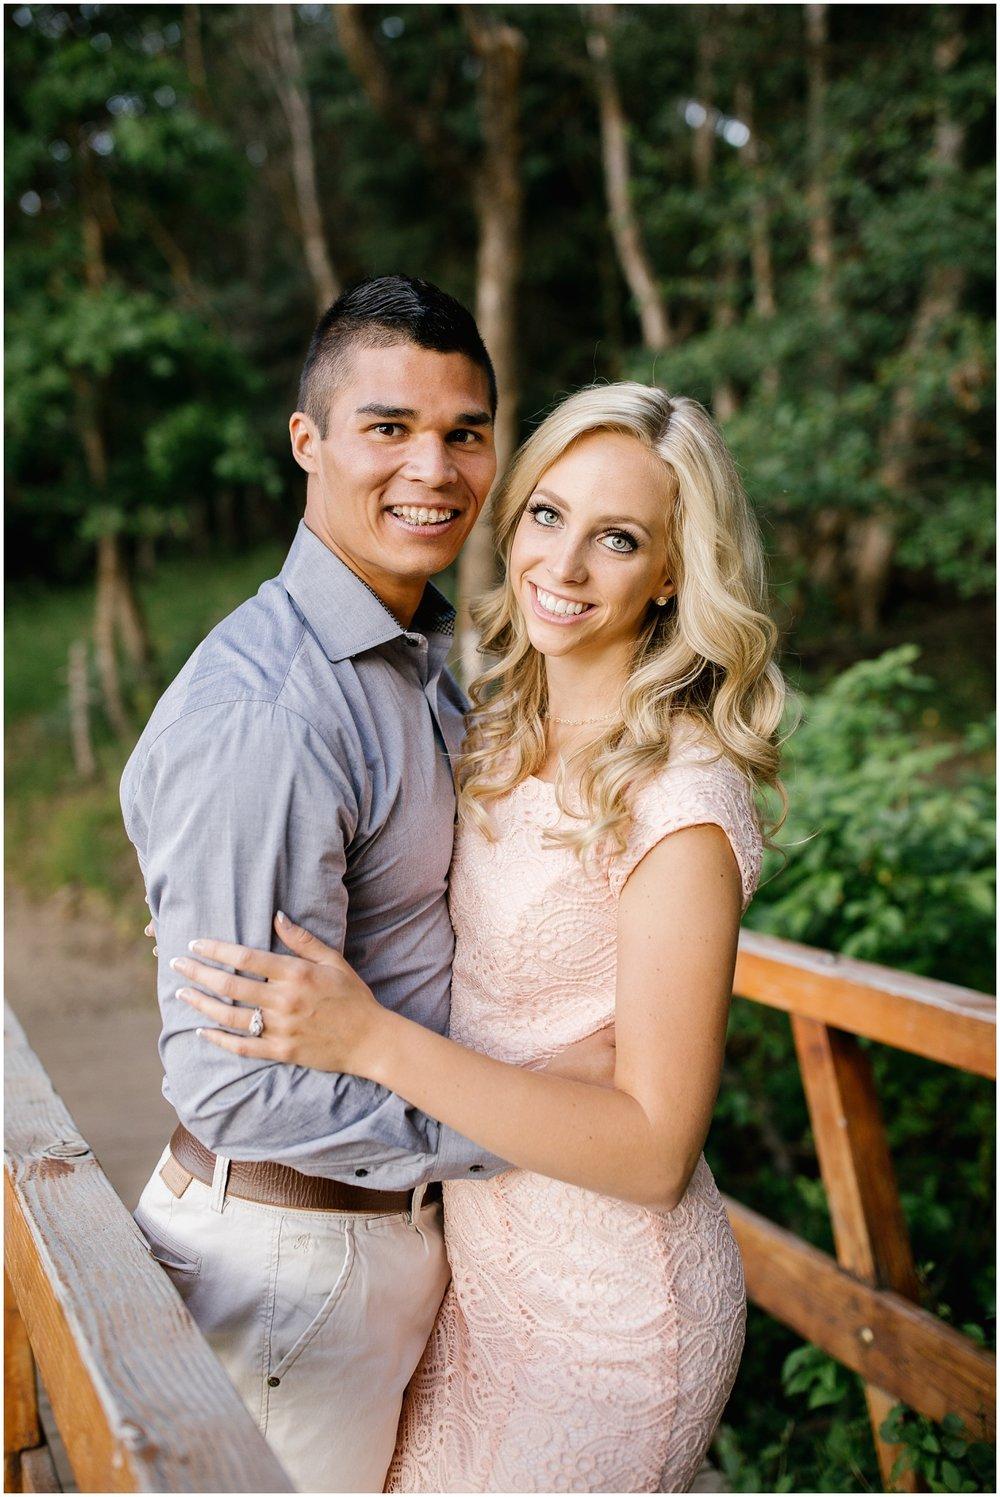 HCengagements-137_Lizzie-B-Imagery-Utah-Wedding-Photographer-Park-City-Salt-Lake-City-Payson-Canyon-Engagement-Session.jpg